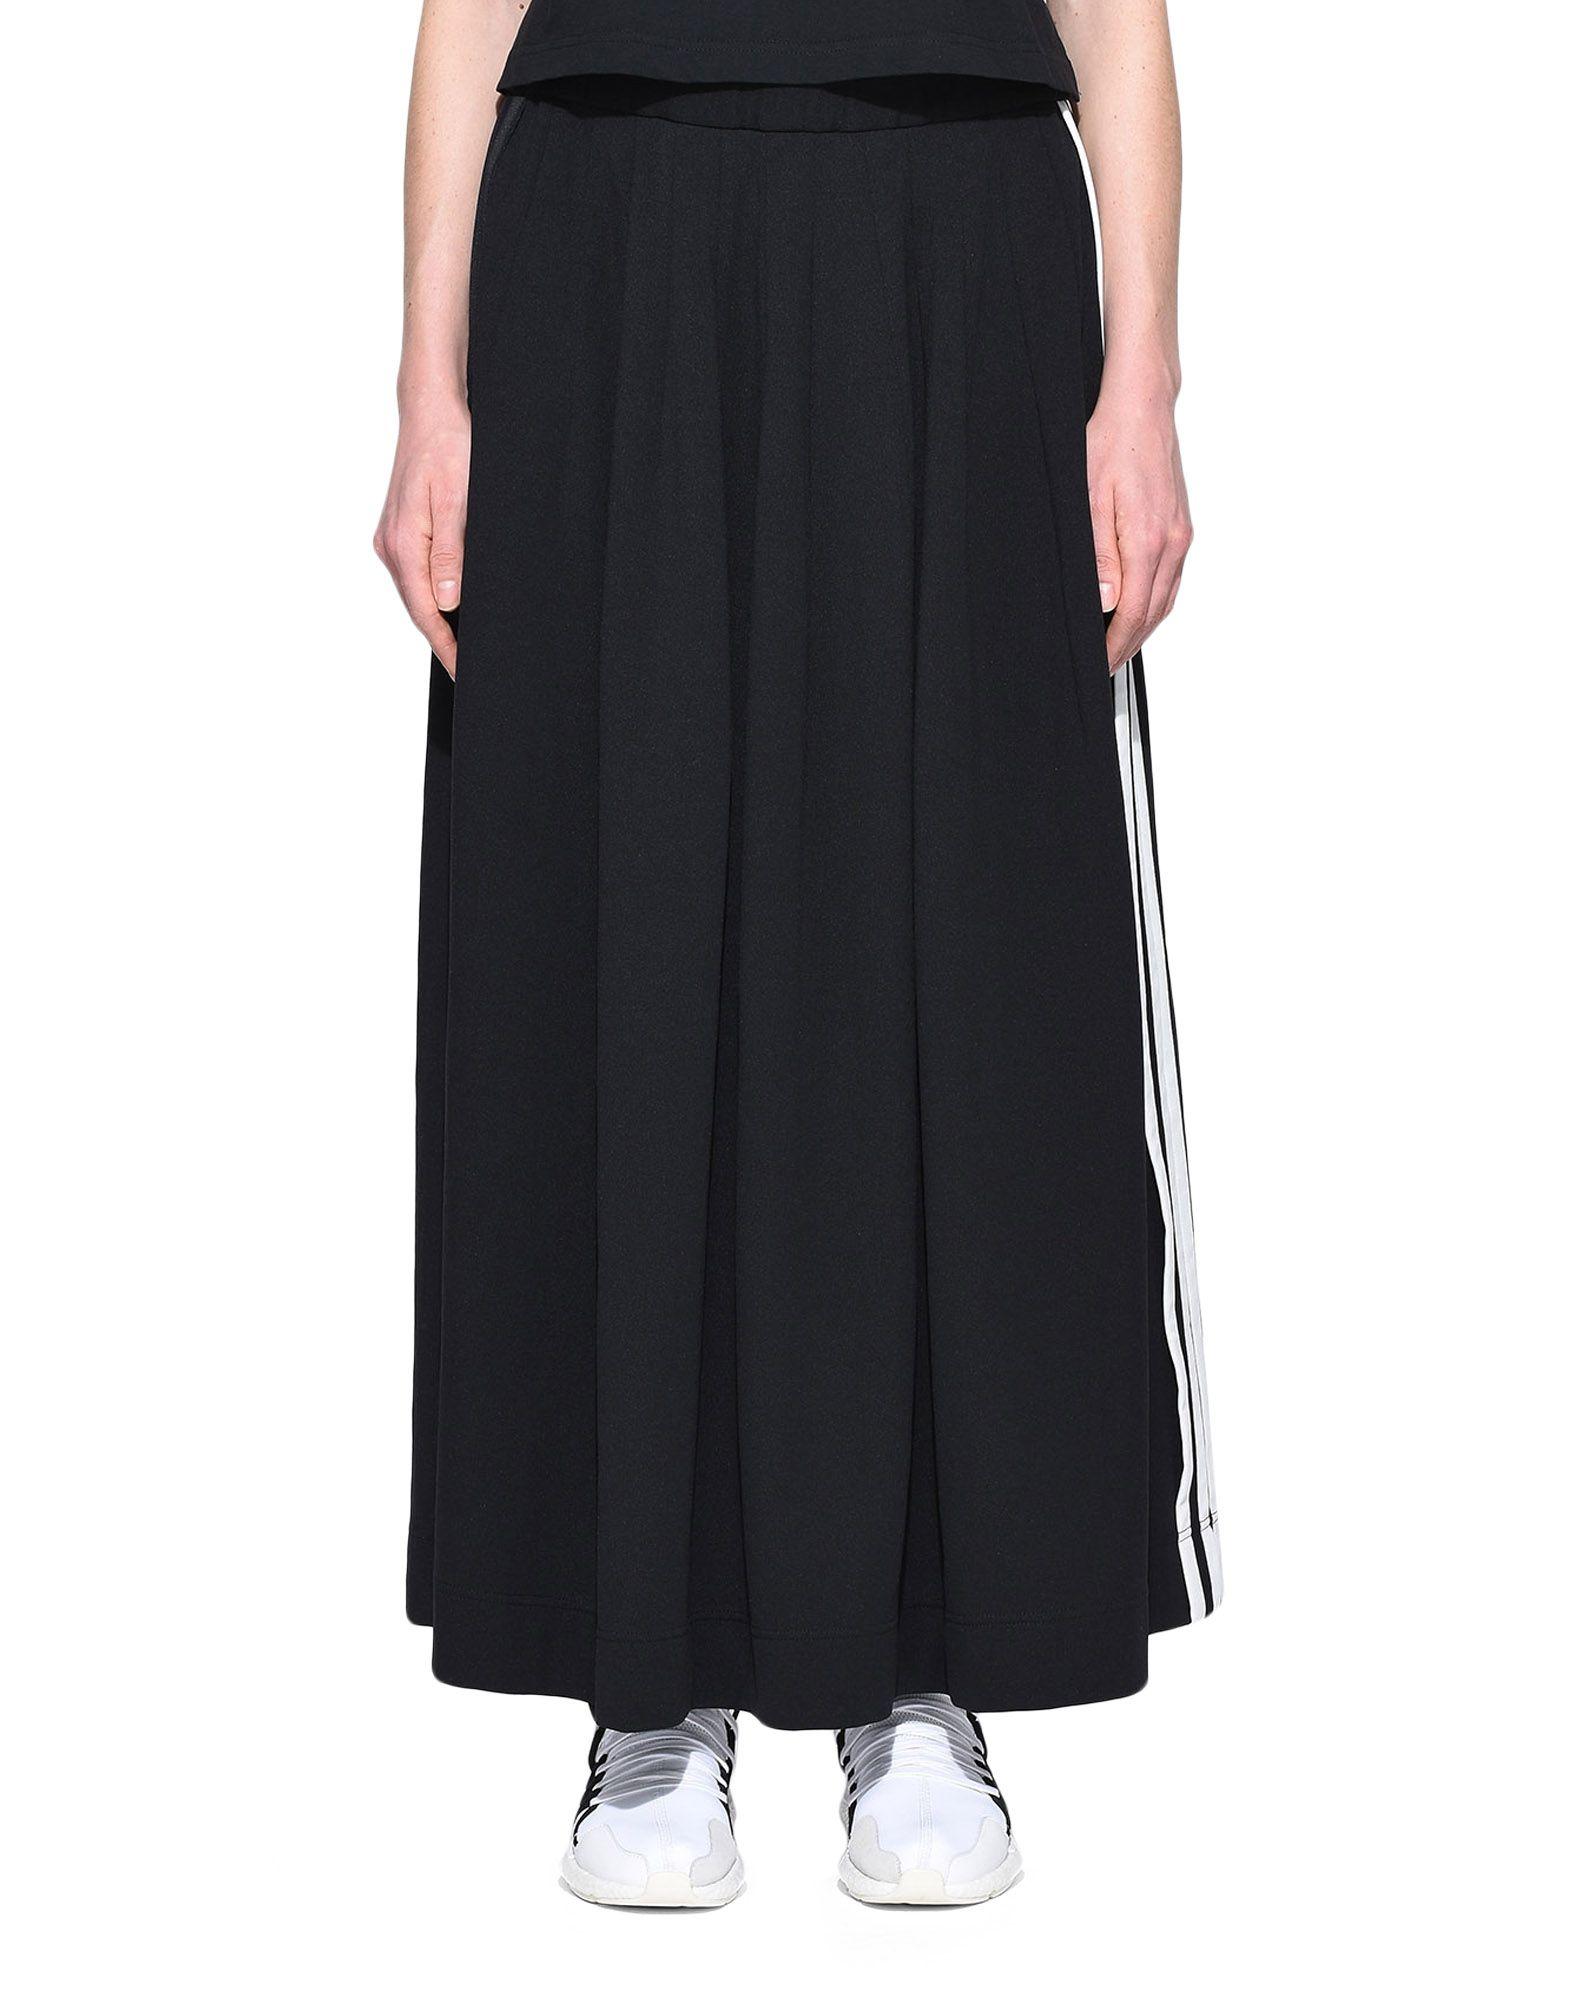 Y-3 Y-3 3-Stripes Selvedge Matte Track Skirt Юбка до колена Для Женщин r